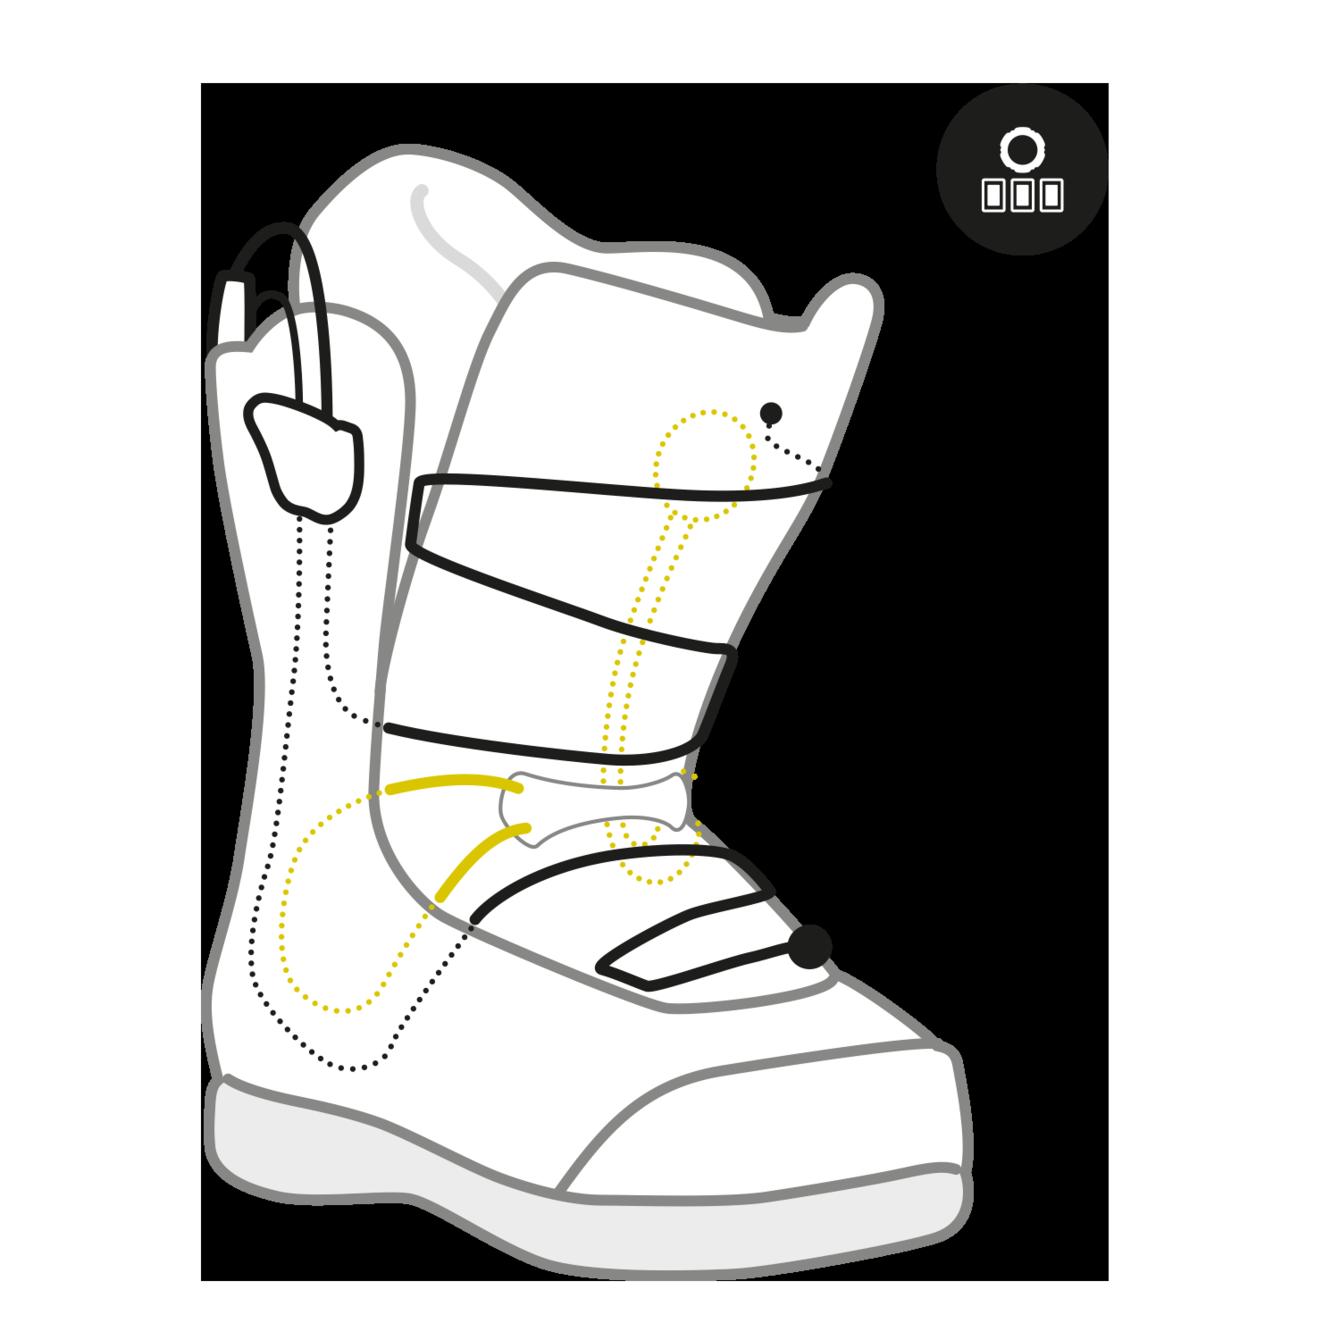 Lace clipart shoe lace. Lacing systems c boa